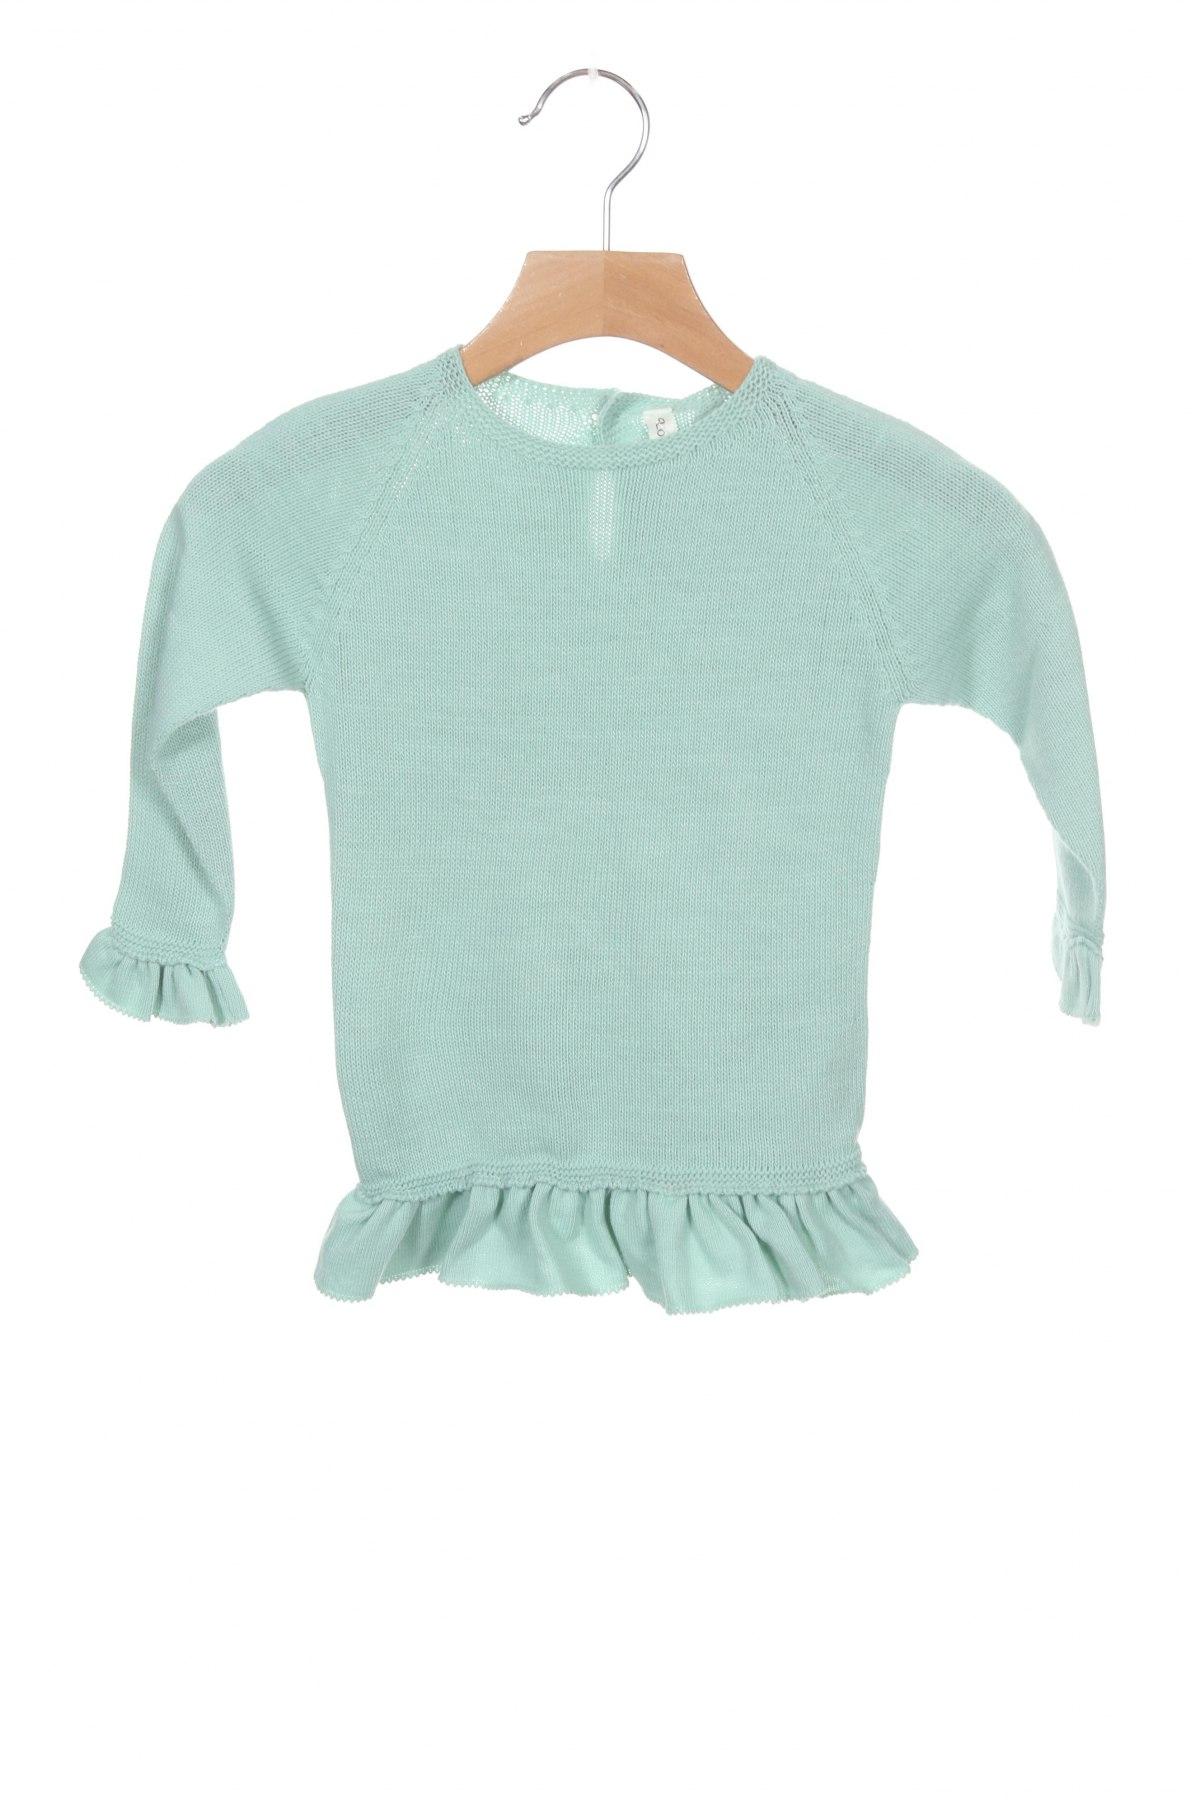 Детска рокля Lola Palacios, Размер 9-12m/ 74-80 см, Цвят Син, Акрил, Цена 16,00лв.